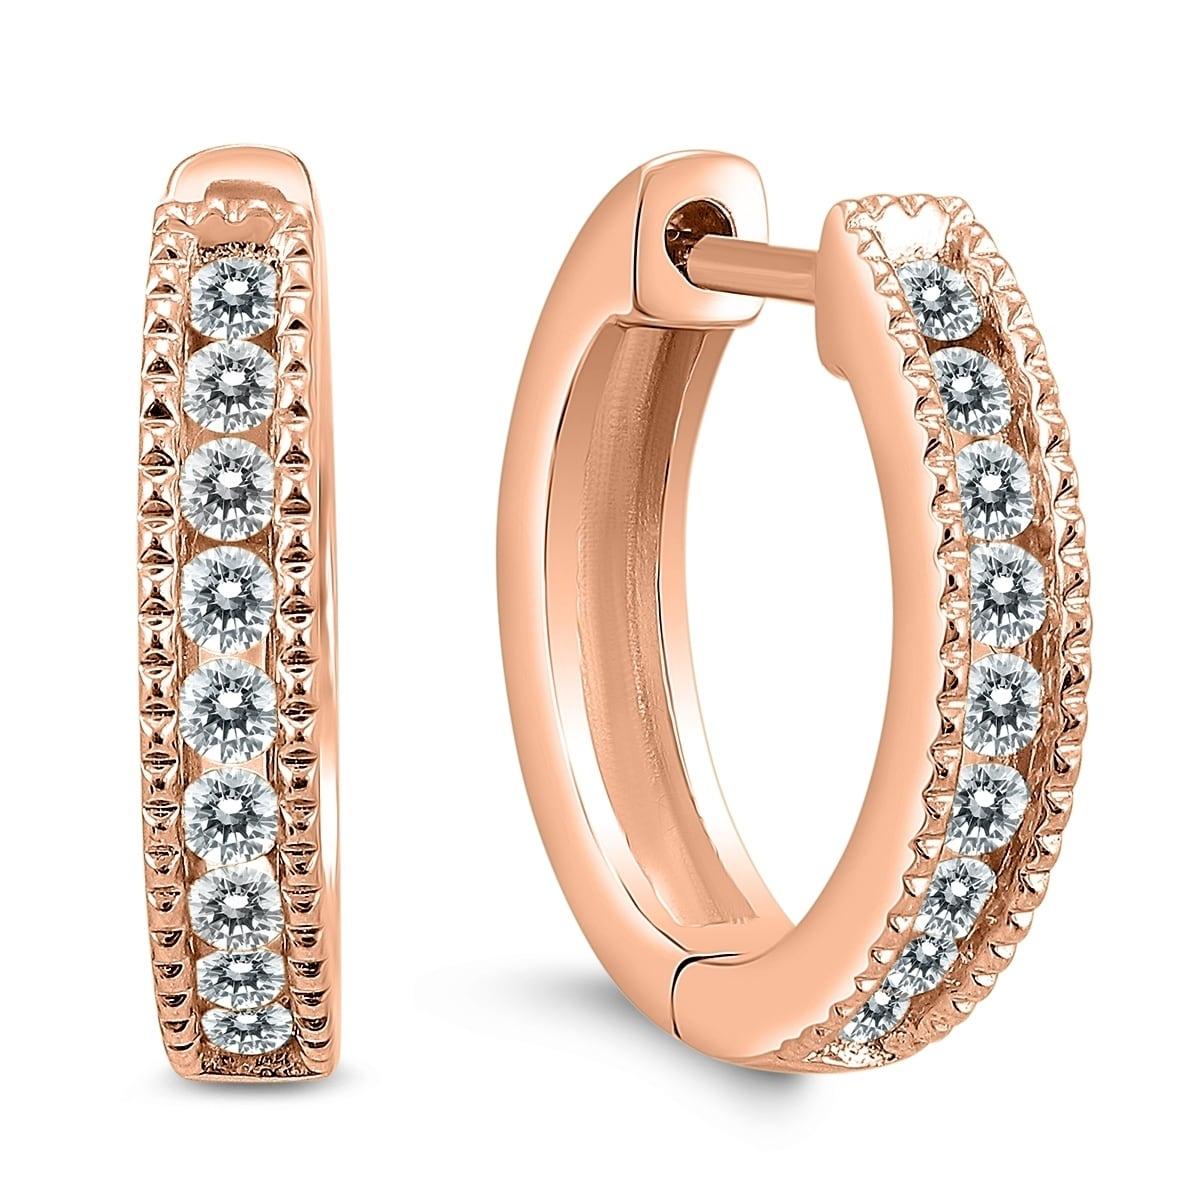 Holiday Sale VVS1 Black Diamond Accent Huggies Hoop Earrings 18K Gold Over